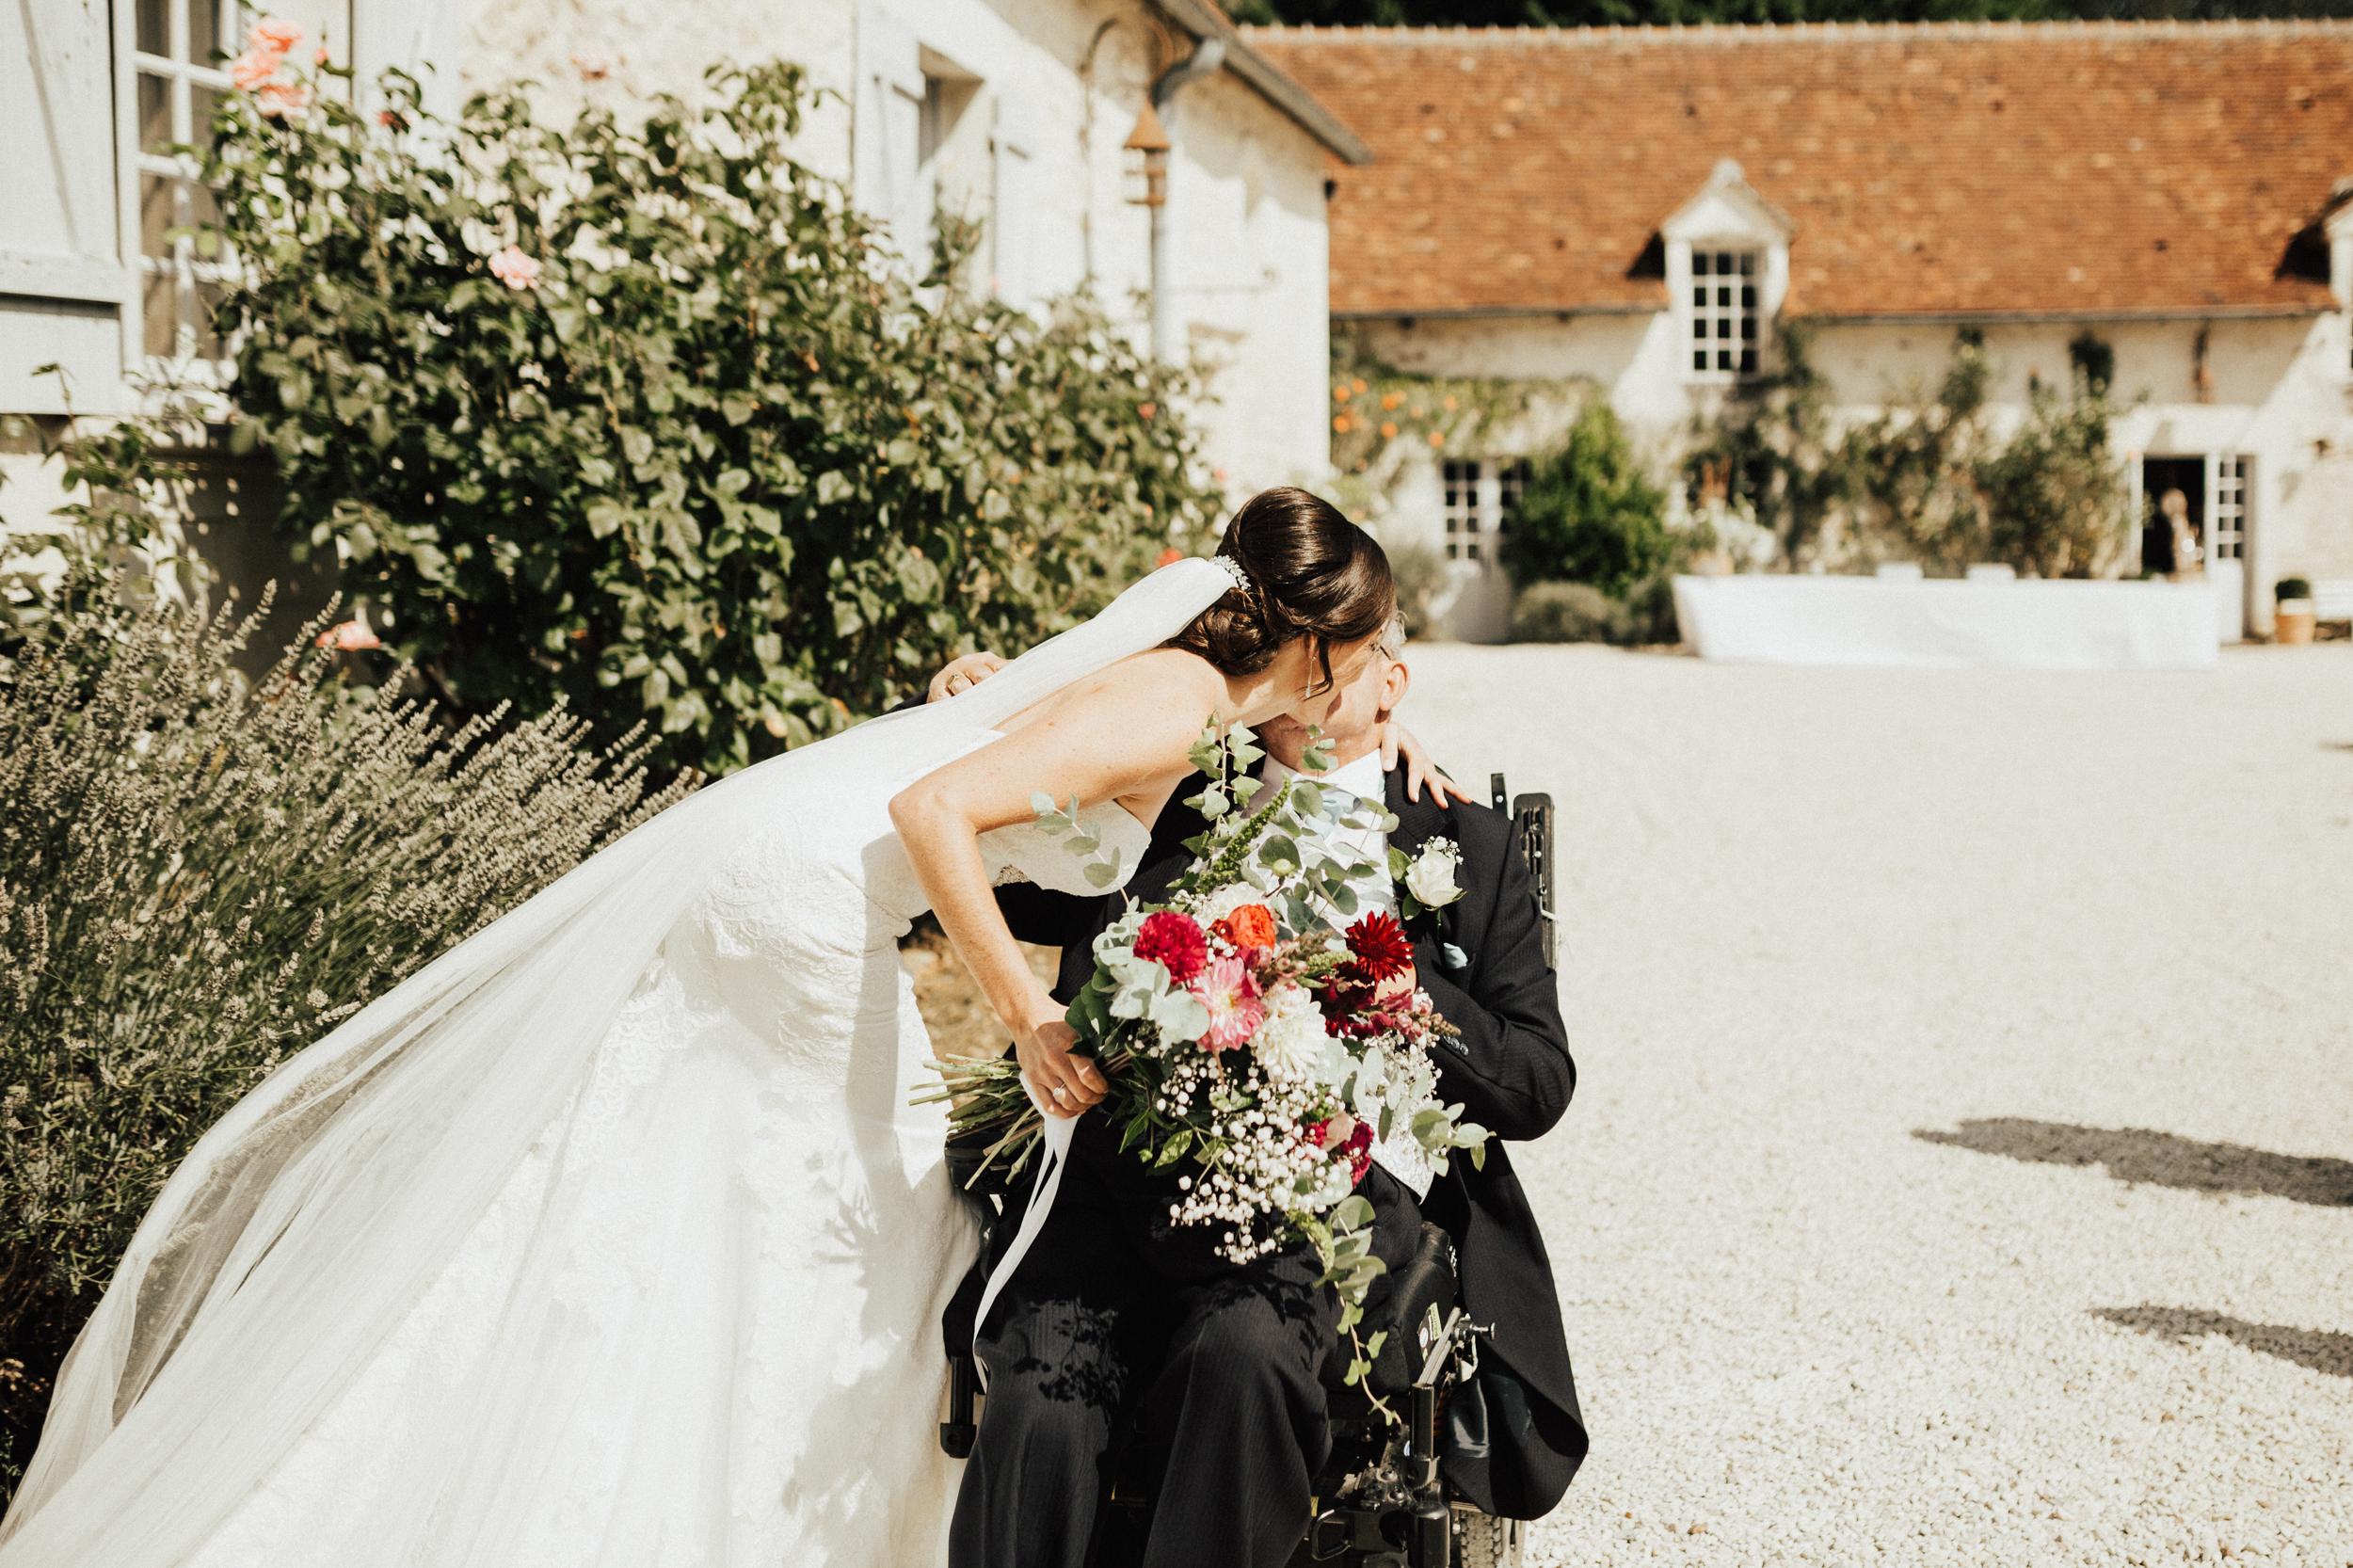 Amy-Zac-Destination-Wedding-France-Manoir-Foulquetiere-Darina-Stoda-Photography-35.jpg